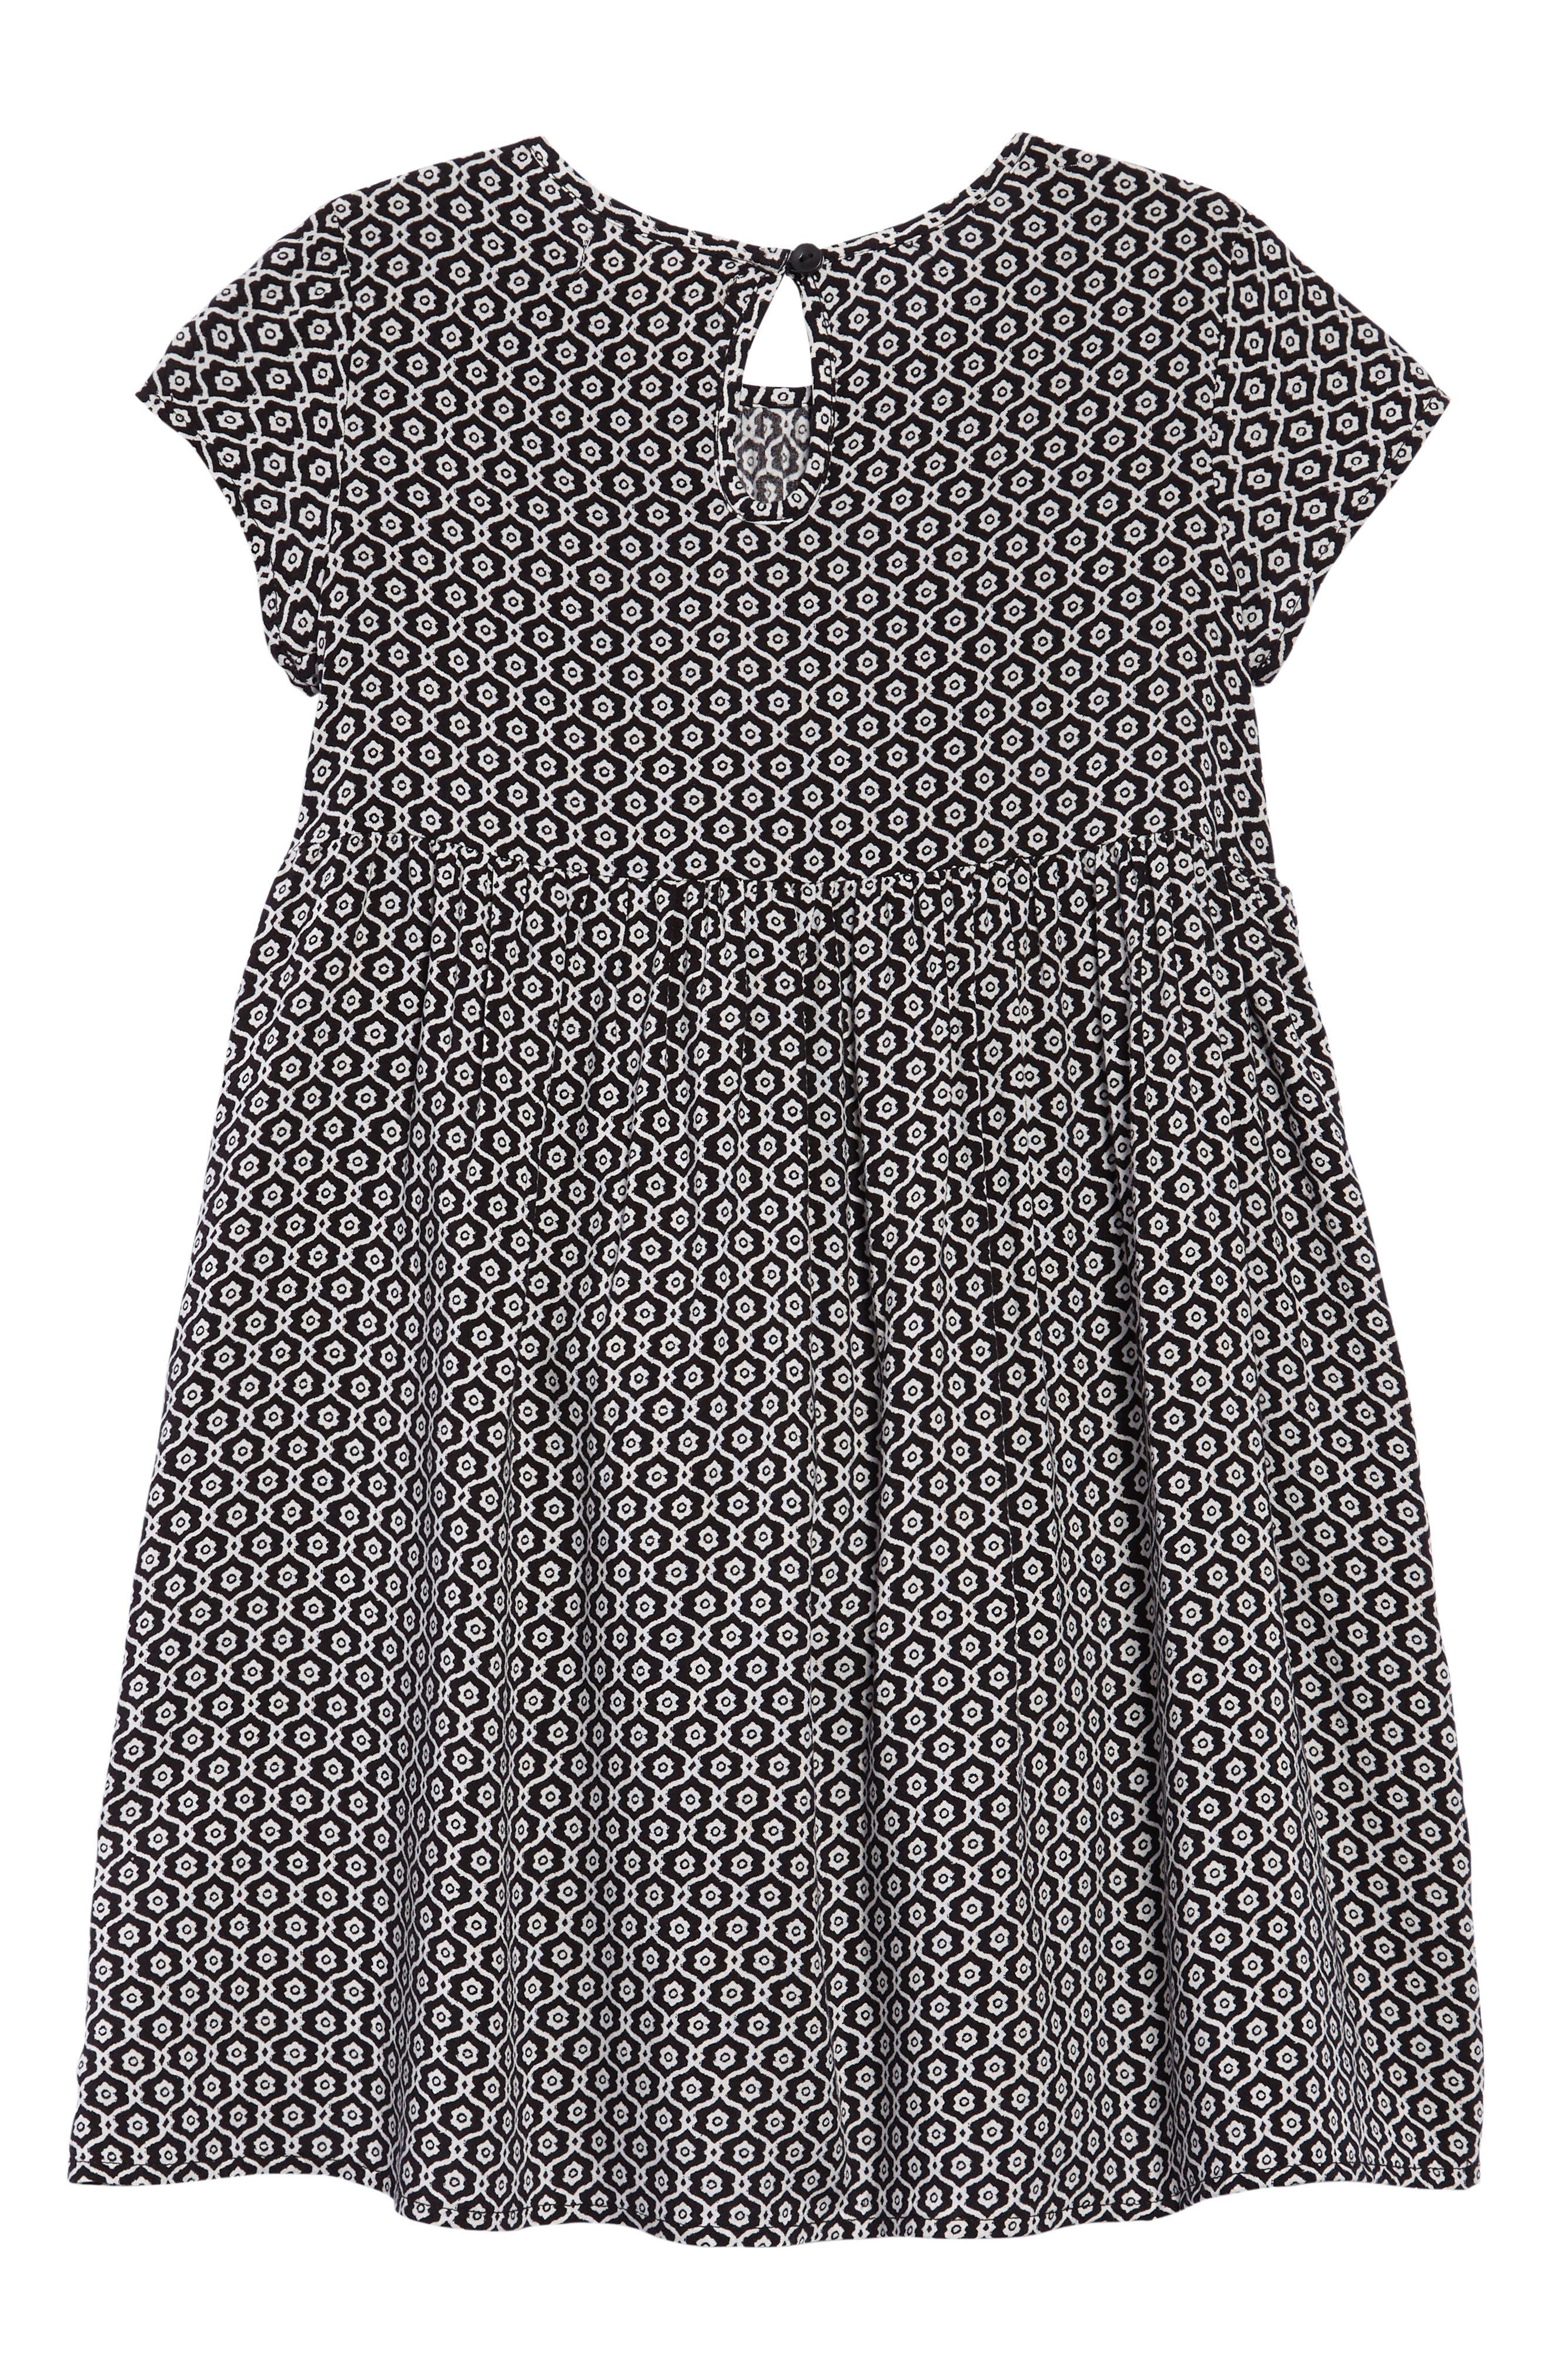 Print Dress,                             Alternate thumbnail 2, color,                             Black- Ivory Geo